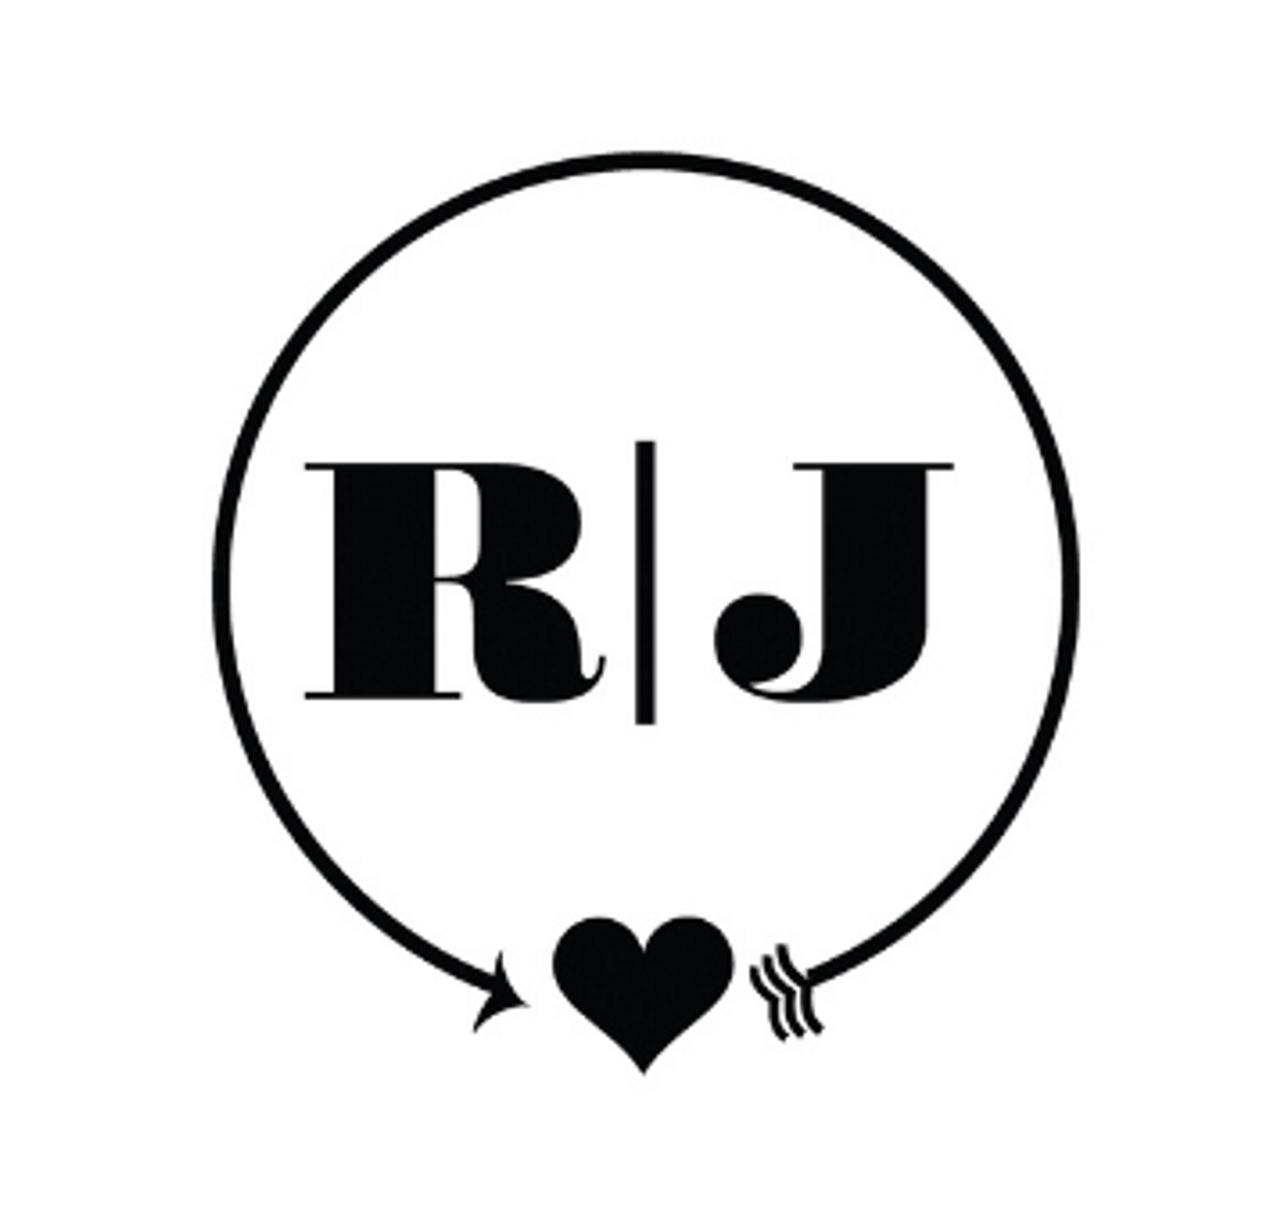 Circle of Love Personalized Self-Inking Monogram Stamp